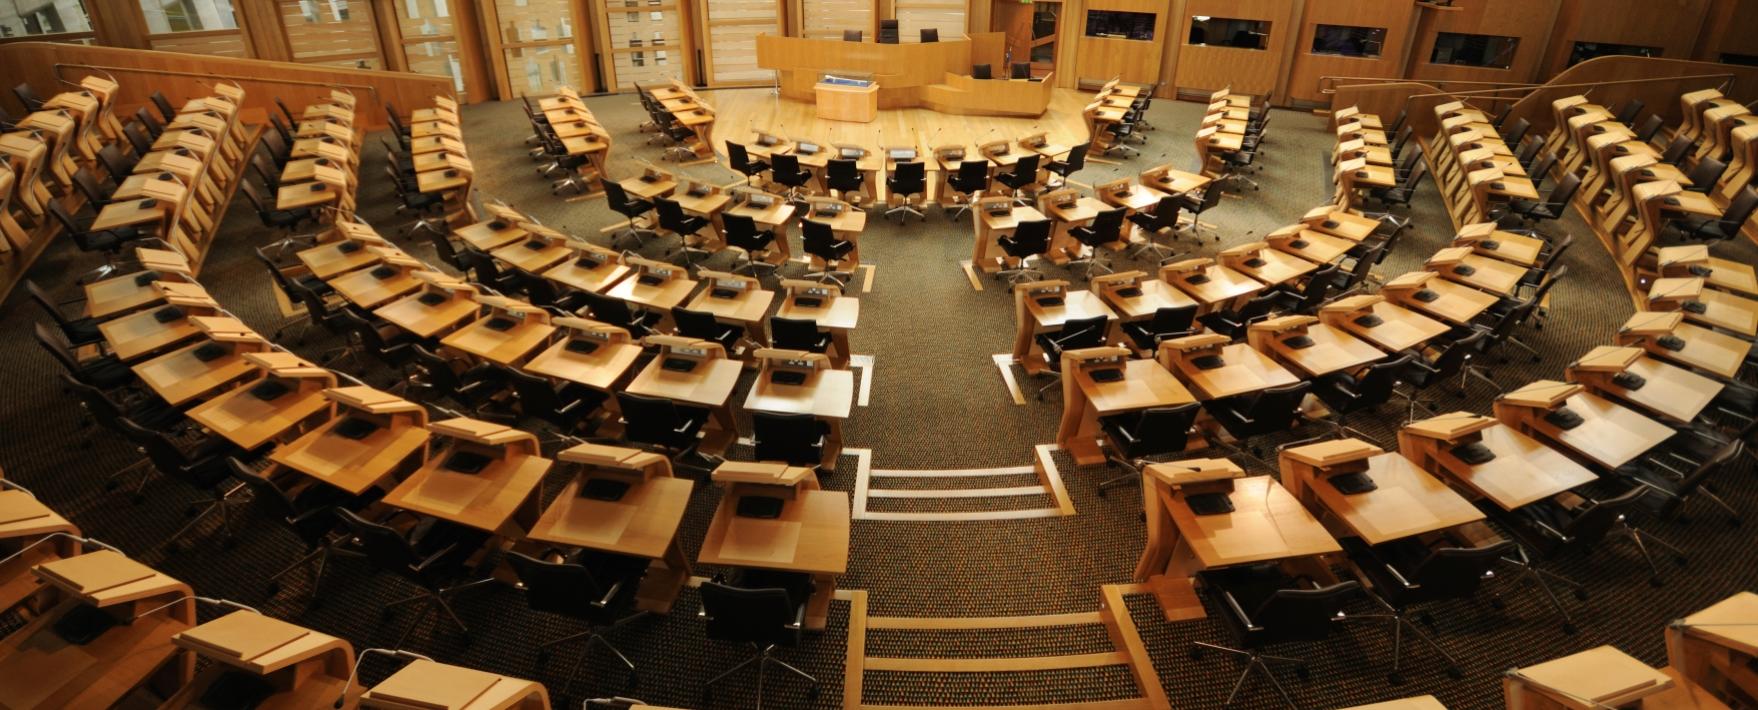 Debating Chamber, Scottish Parliament Building